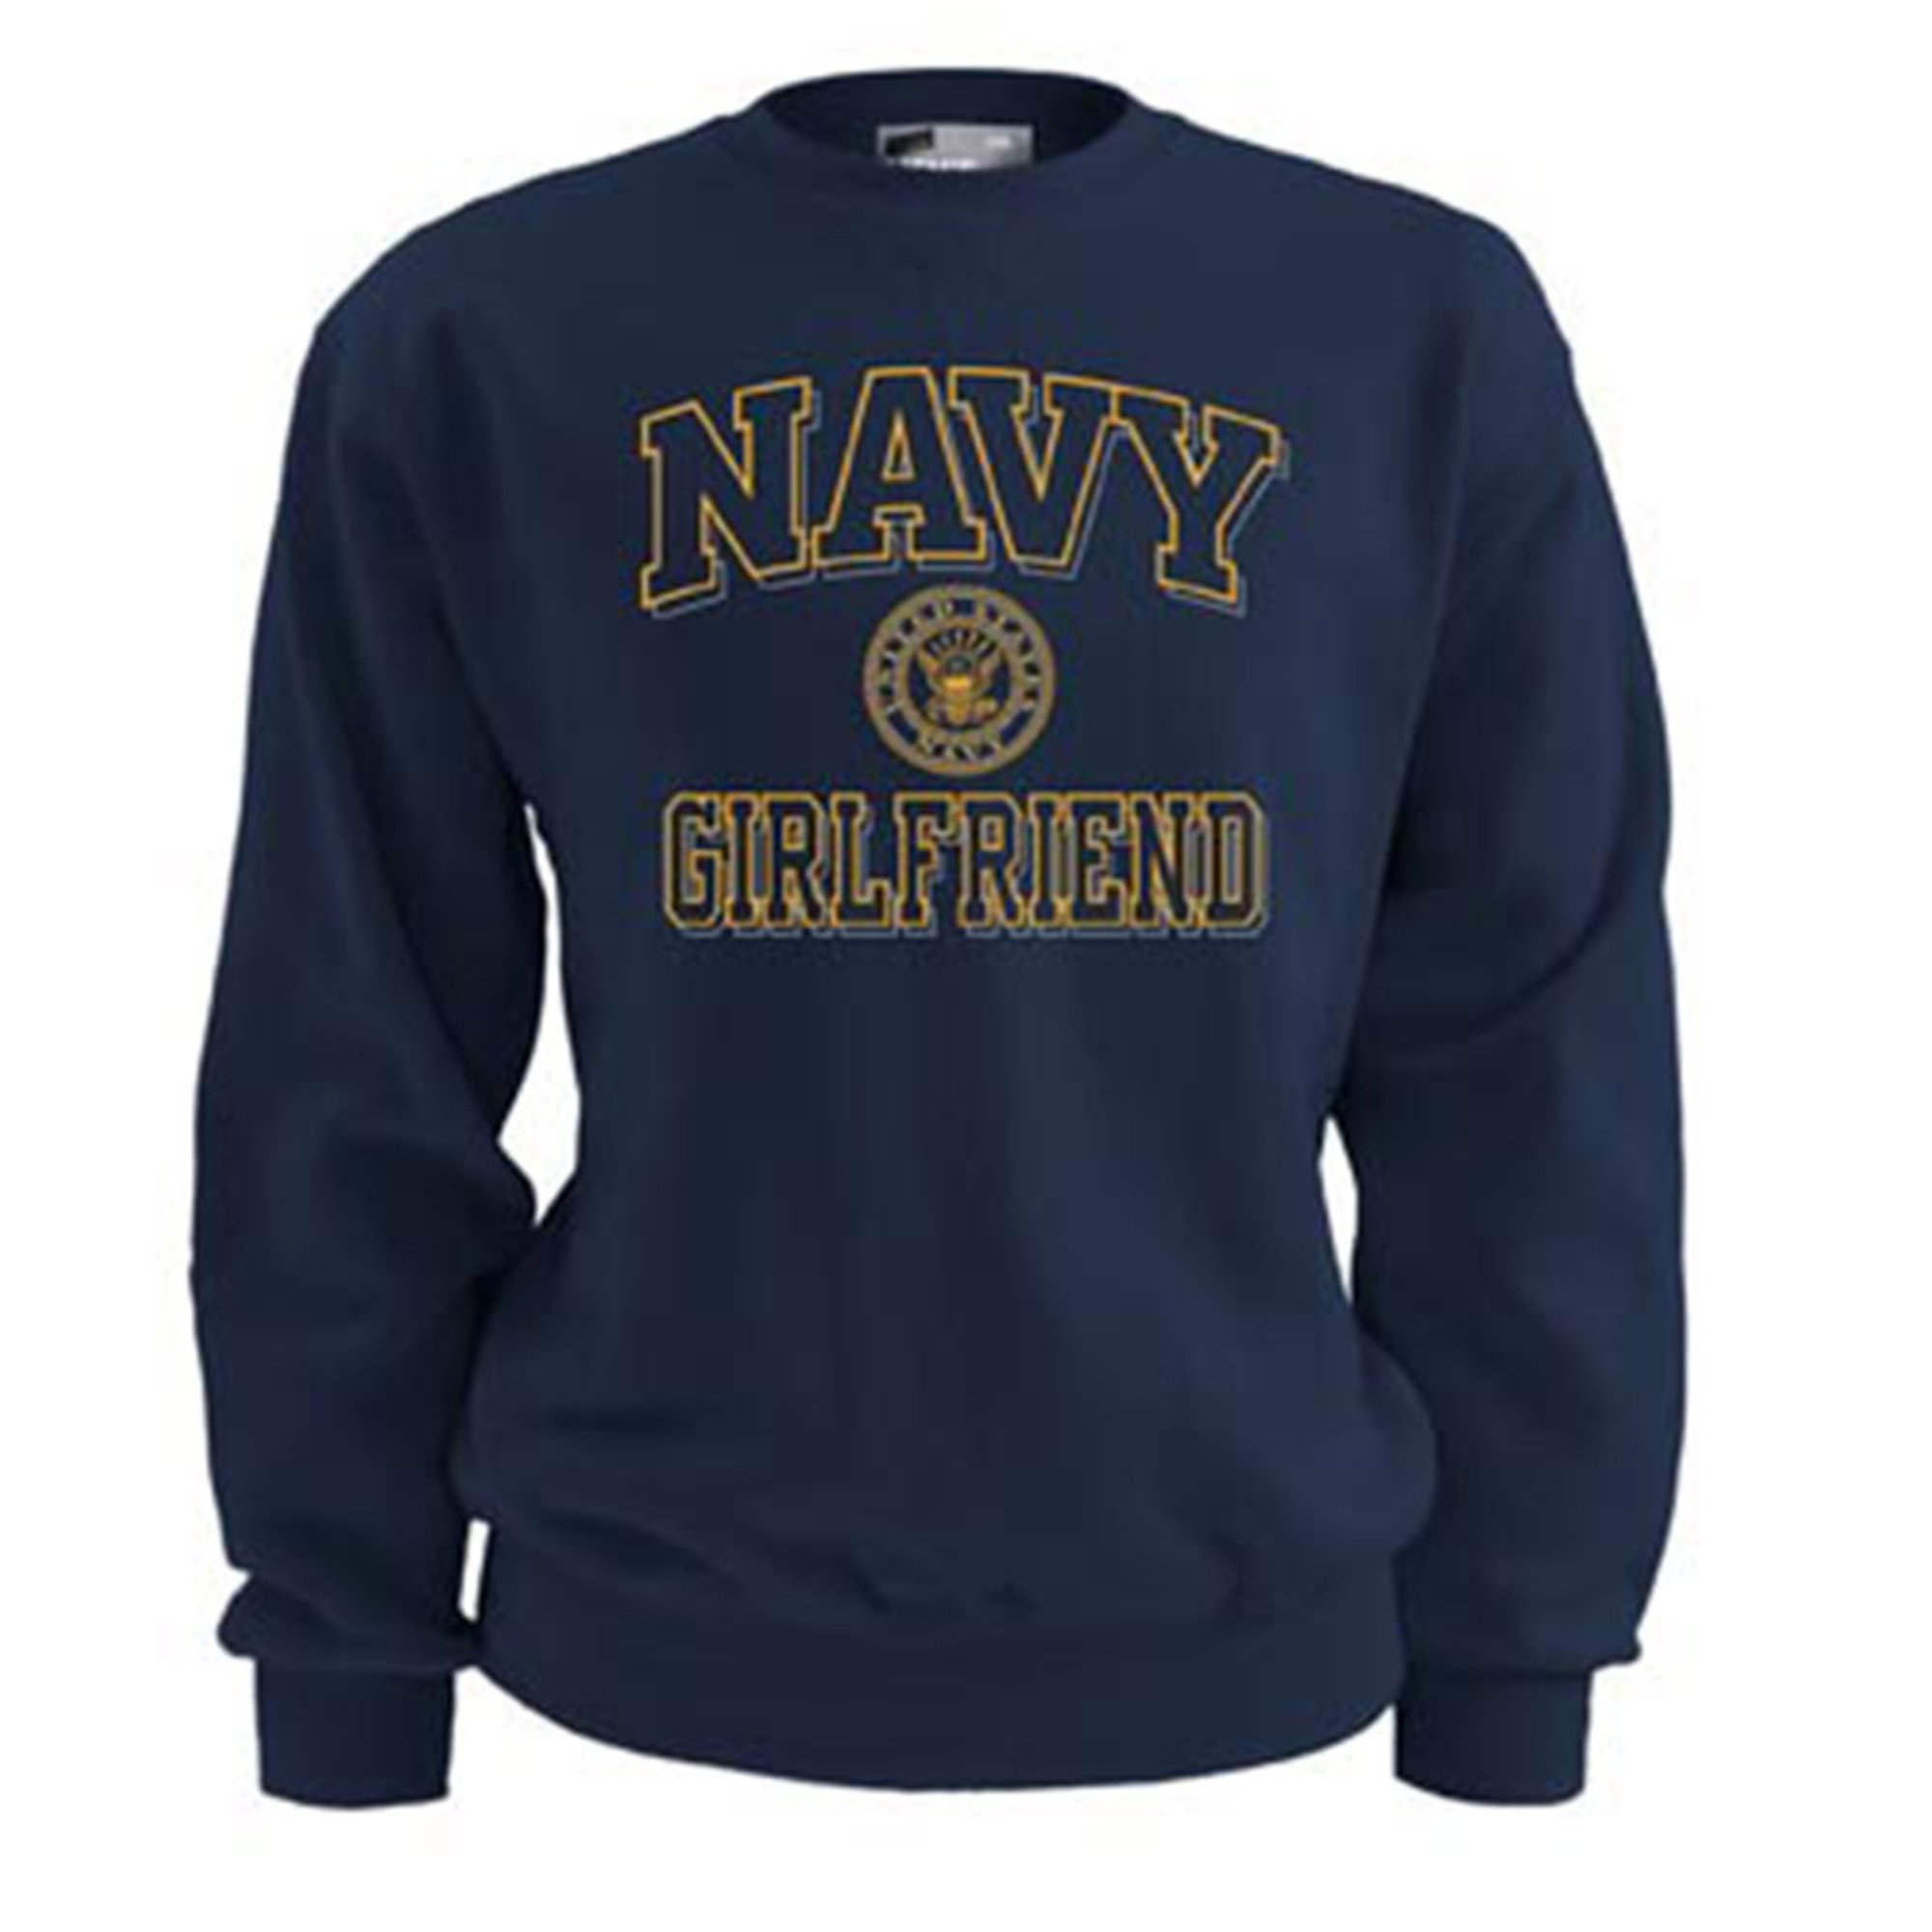 soffe usn navy fleece crew sweatshirt navy a